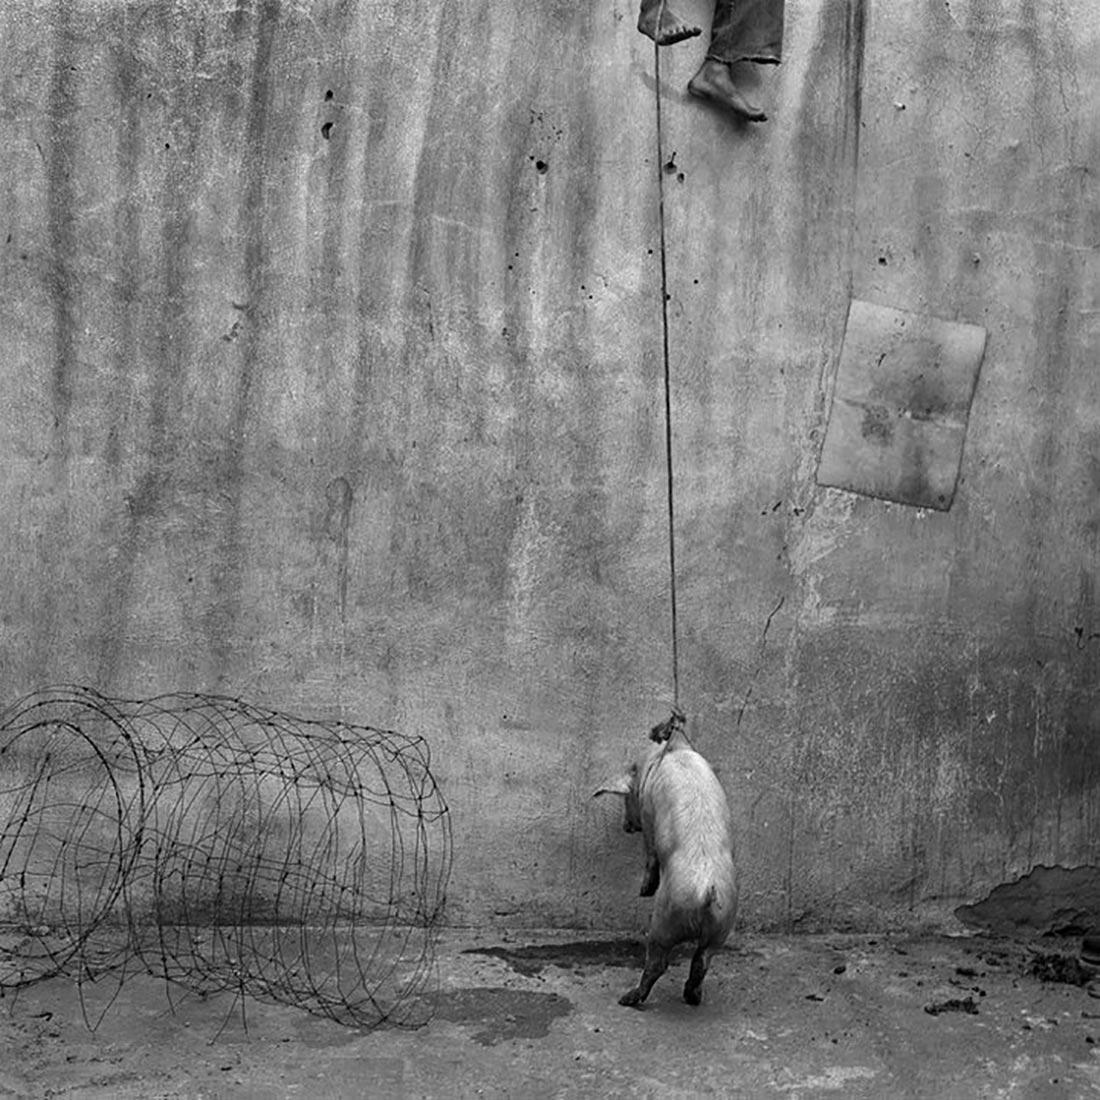 Hanging pig, 2001, Roger Ballen.